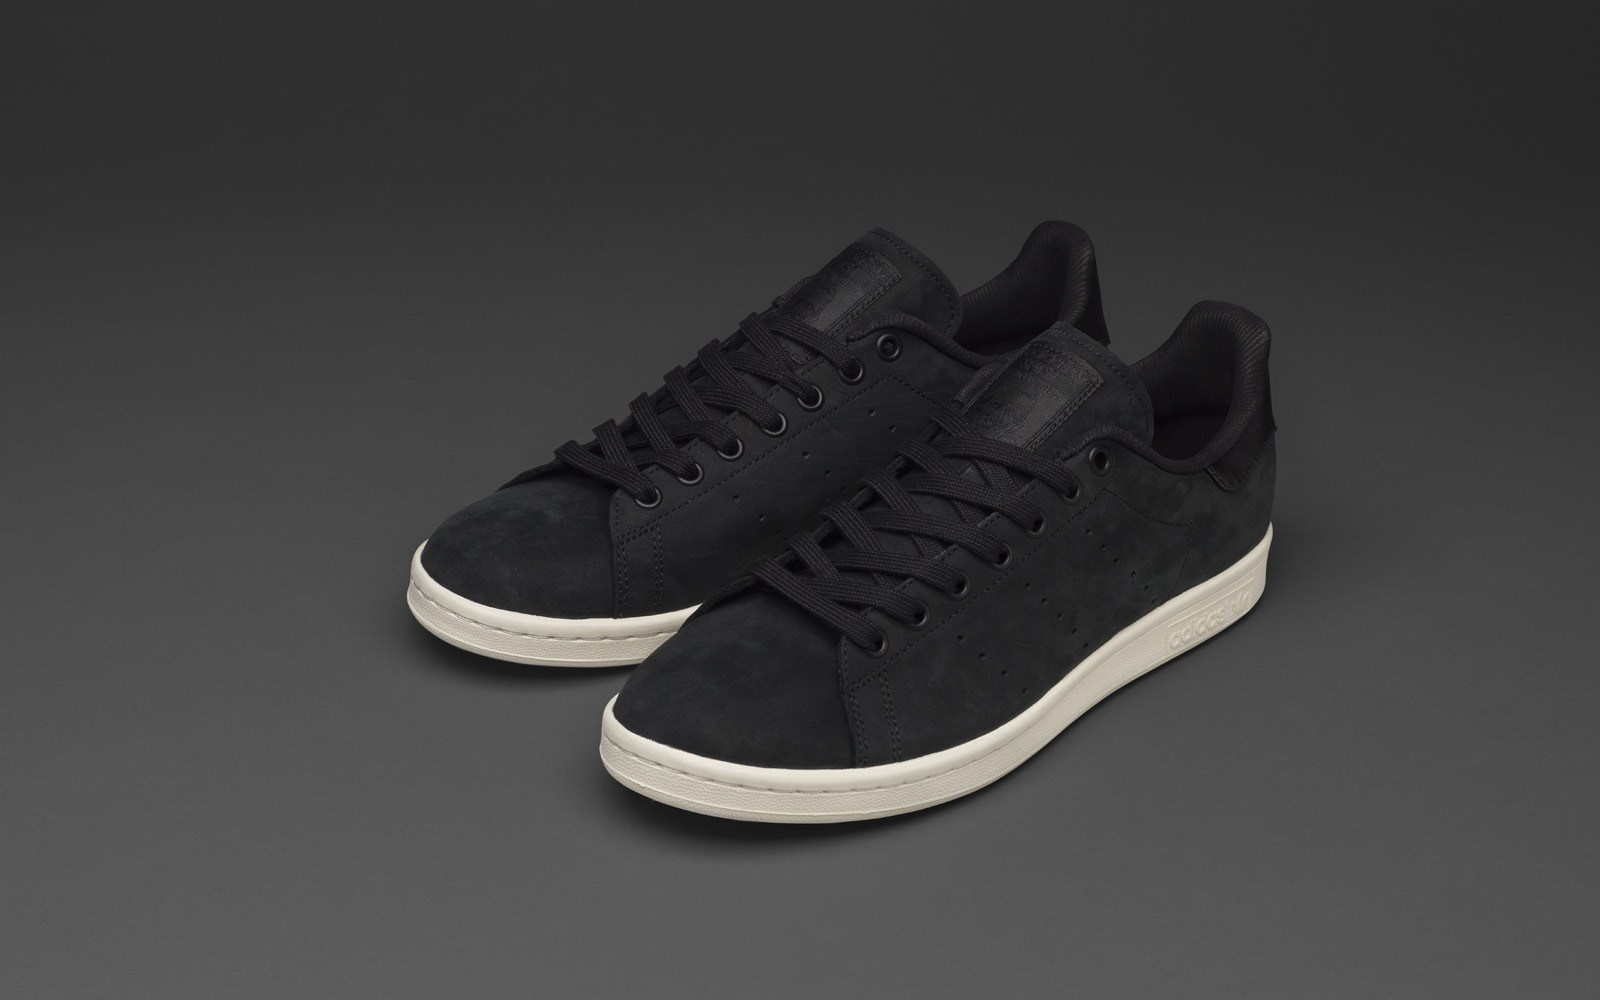 Adidas | adidas Originals Black Nubuck Leather Stan Smith